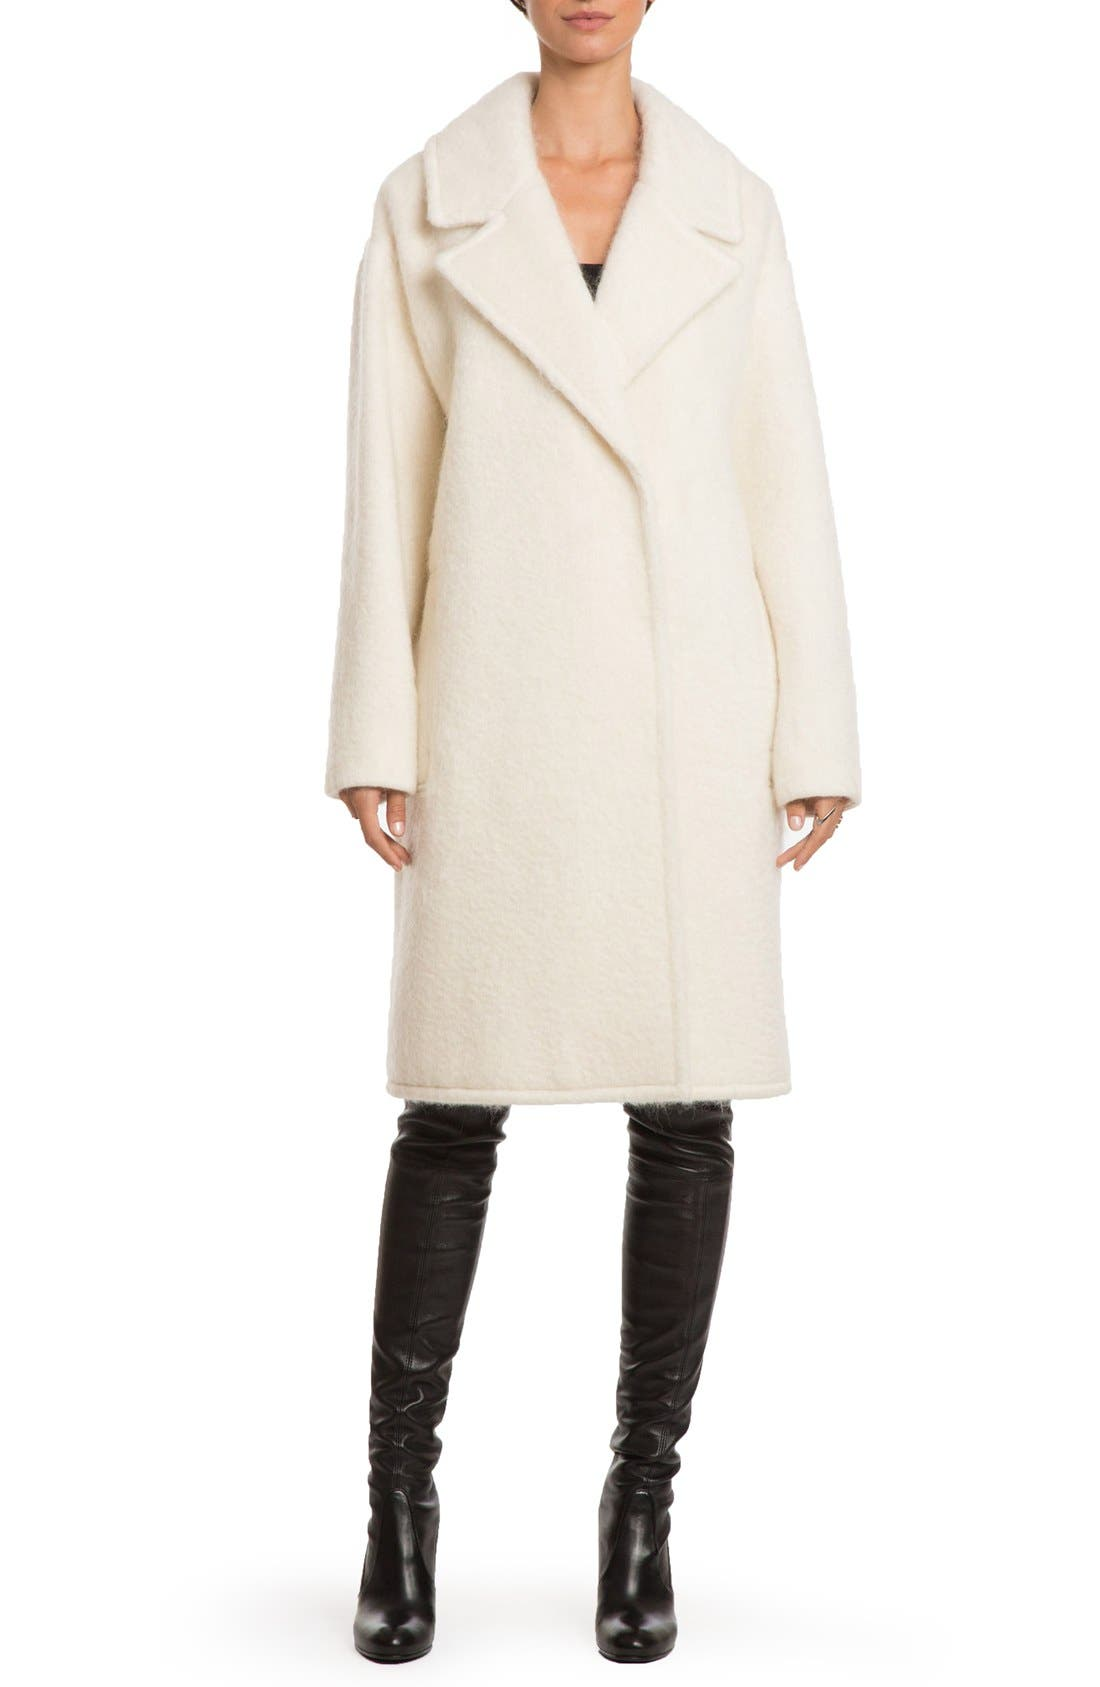 Alternate Image 1 Selected - Badgley Mischka 'Jenna' Snap Back Cocoon Coat